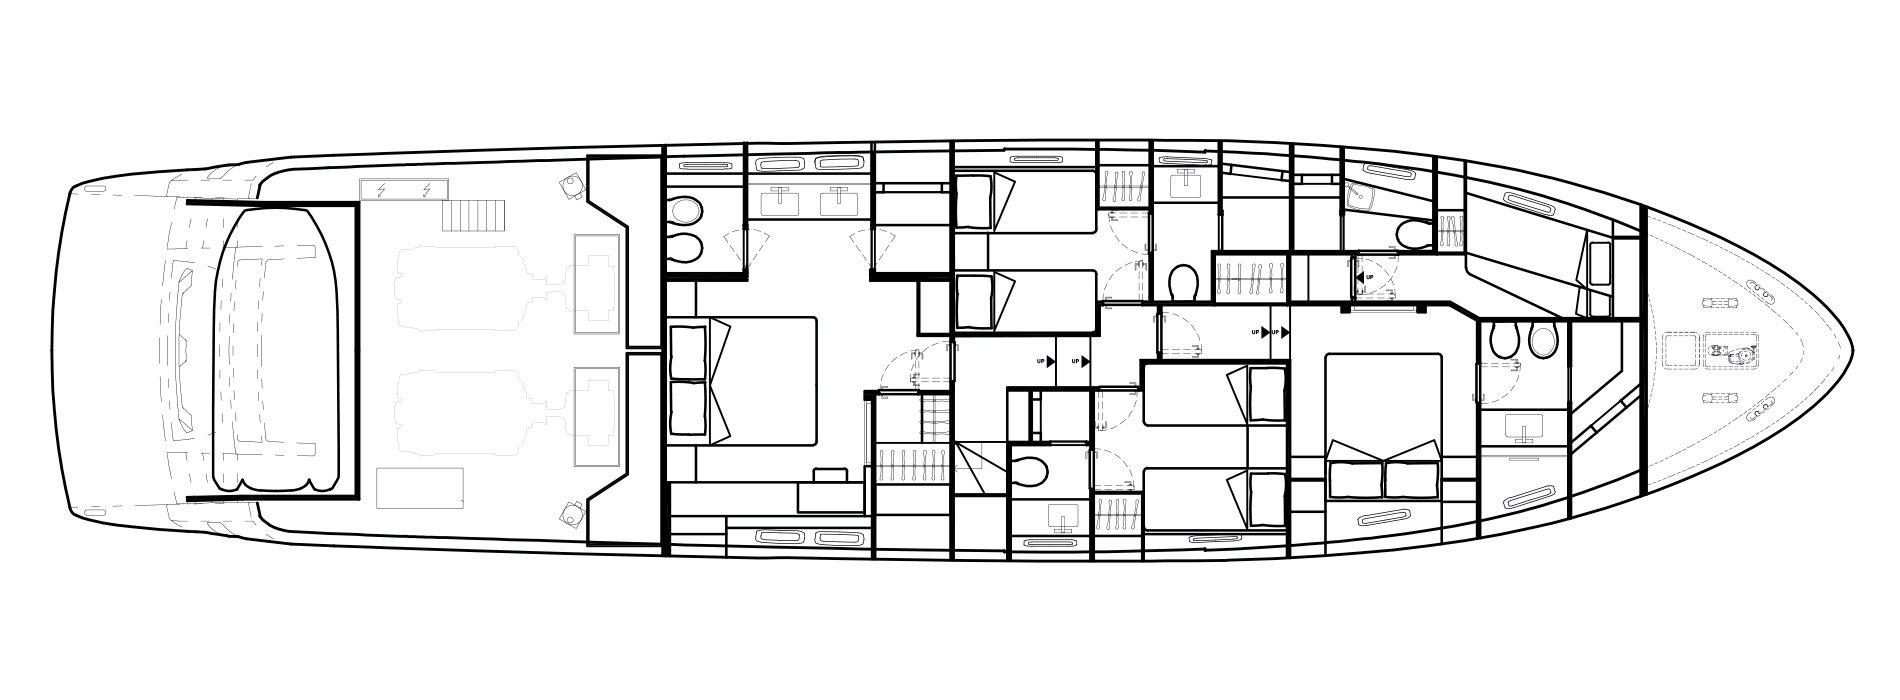 Sanlorenzo Yachts SL78 Lower Deck Versione B